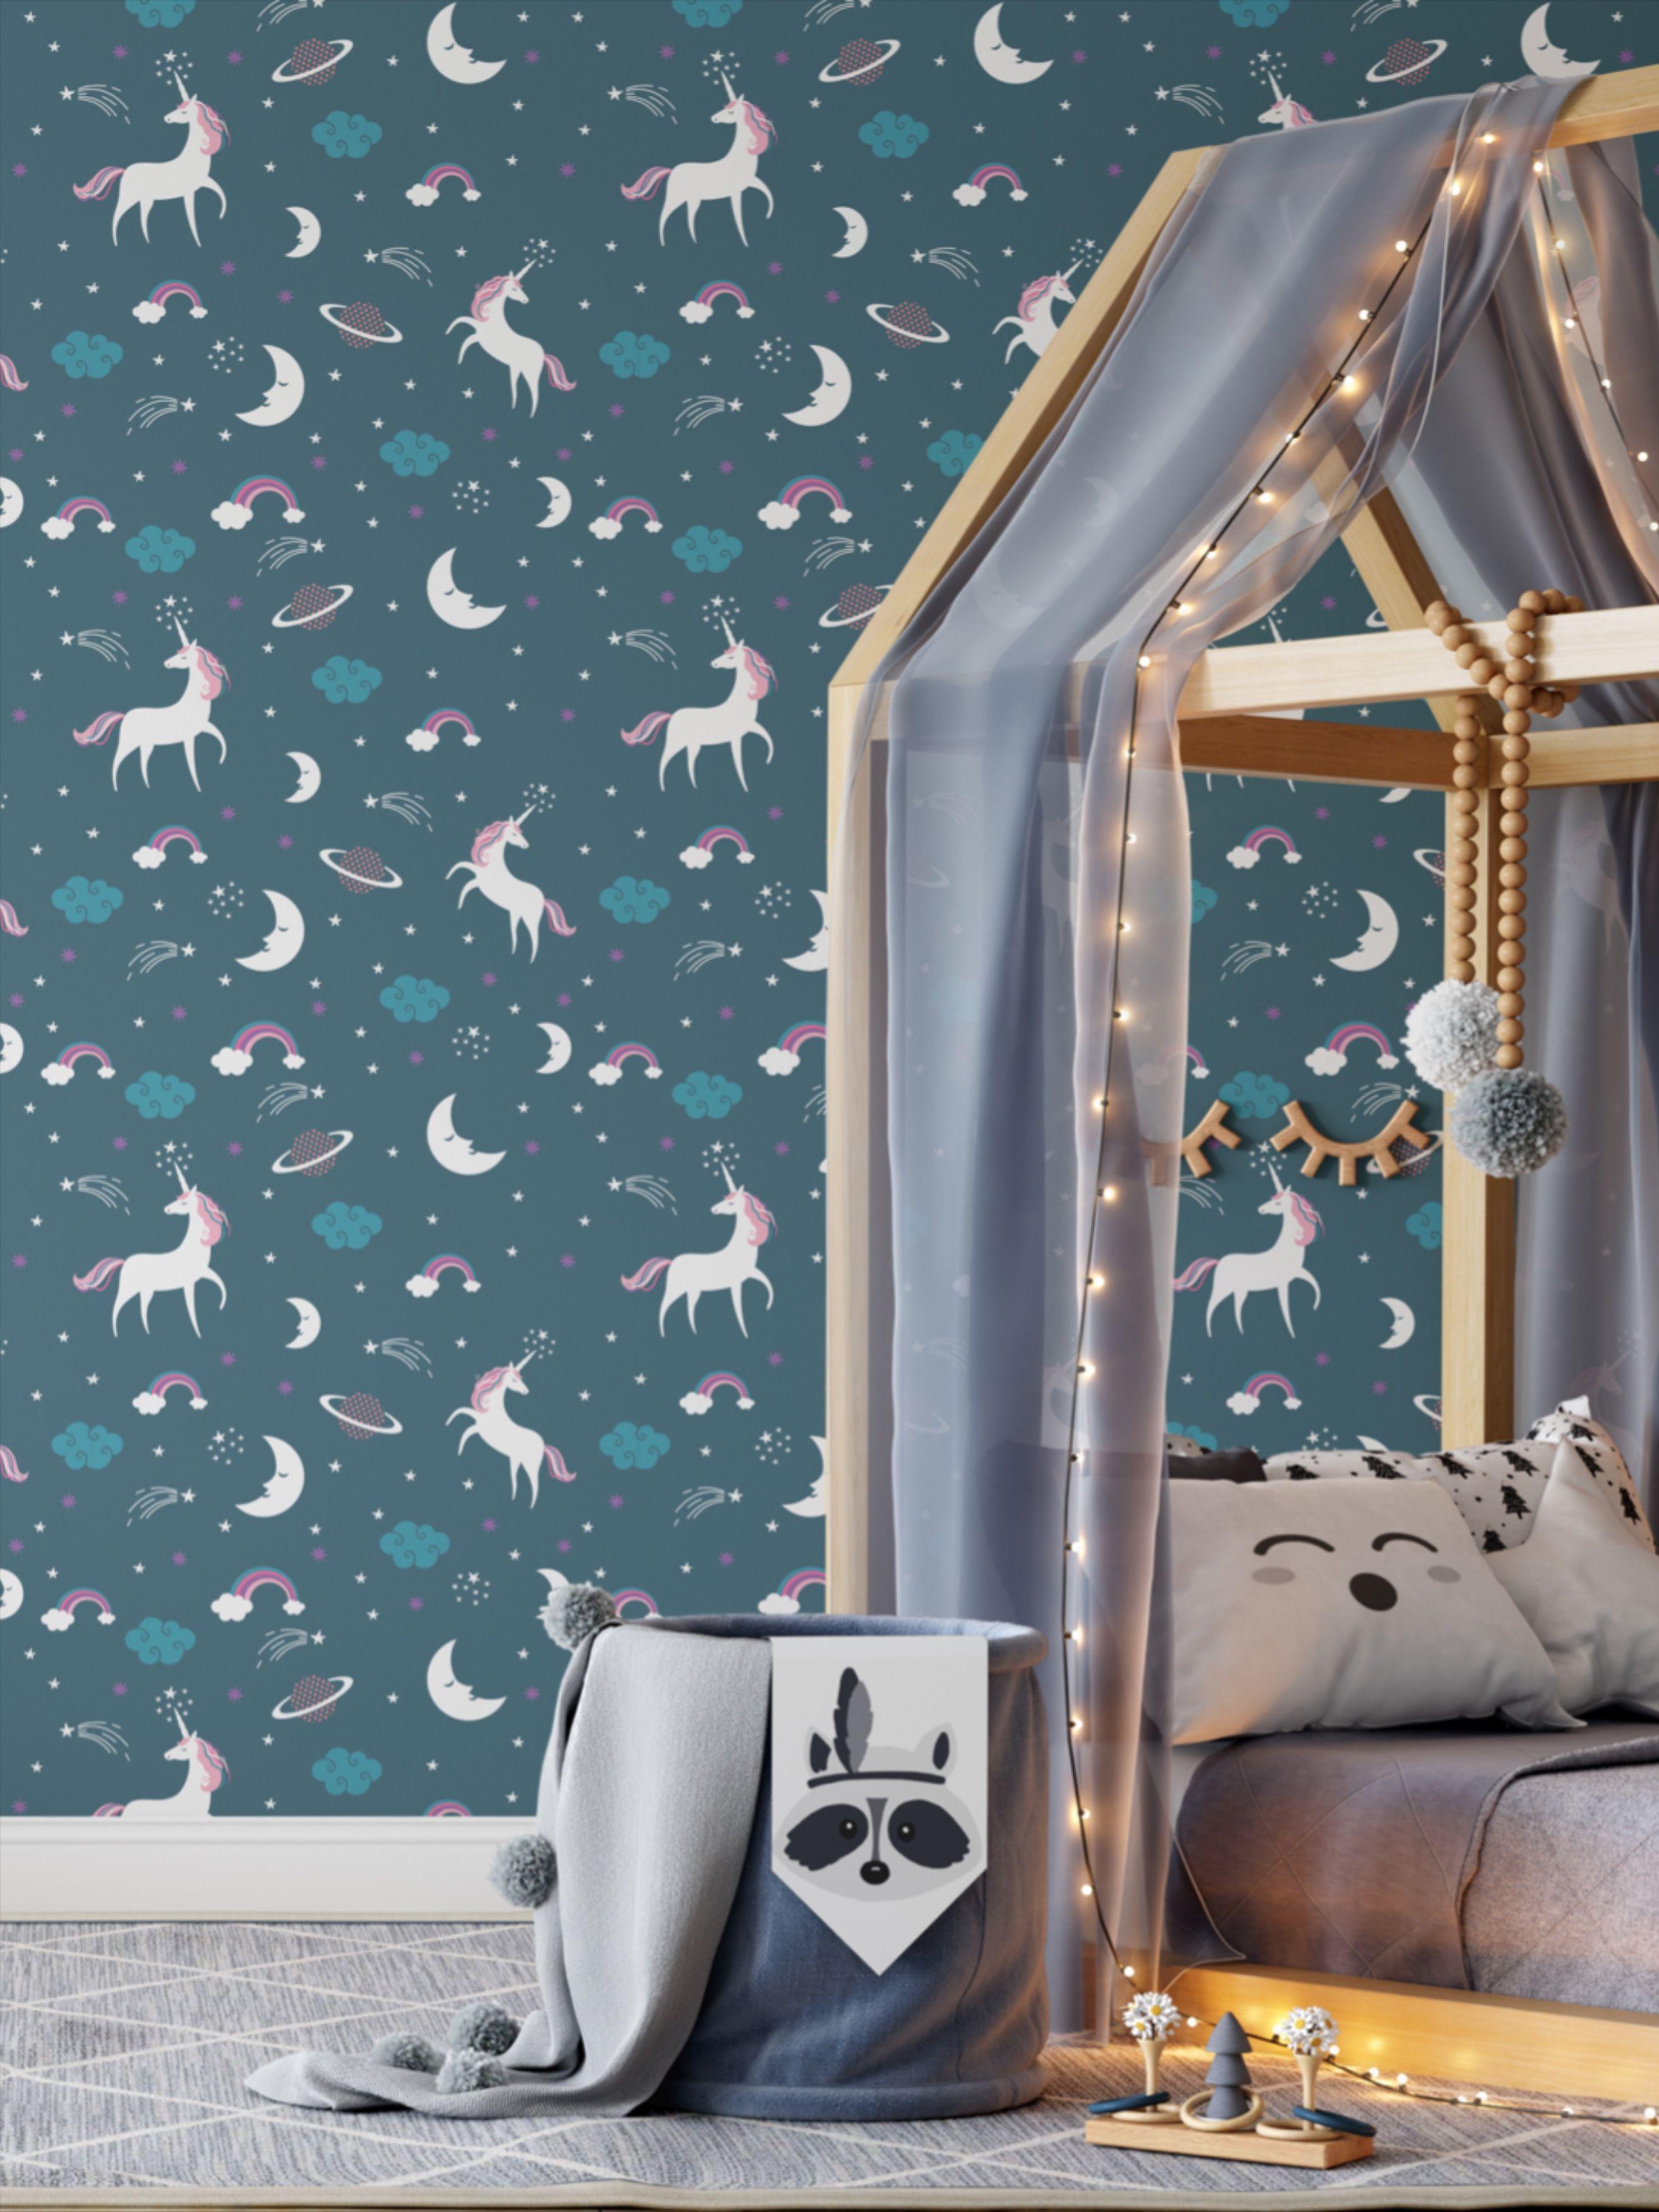 Teal Unicorn Kids Room Wallpaper / Dark Self Adhesive Wall